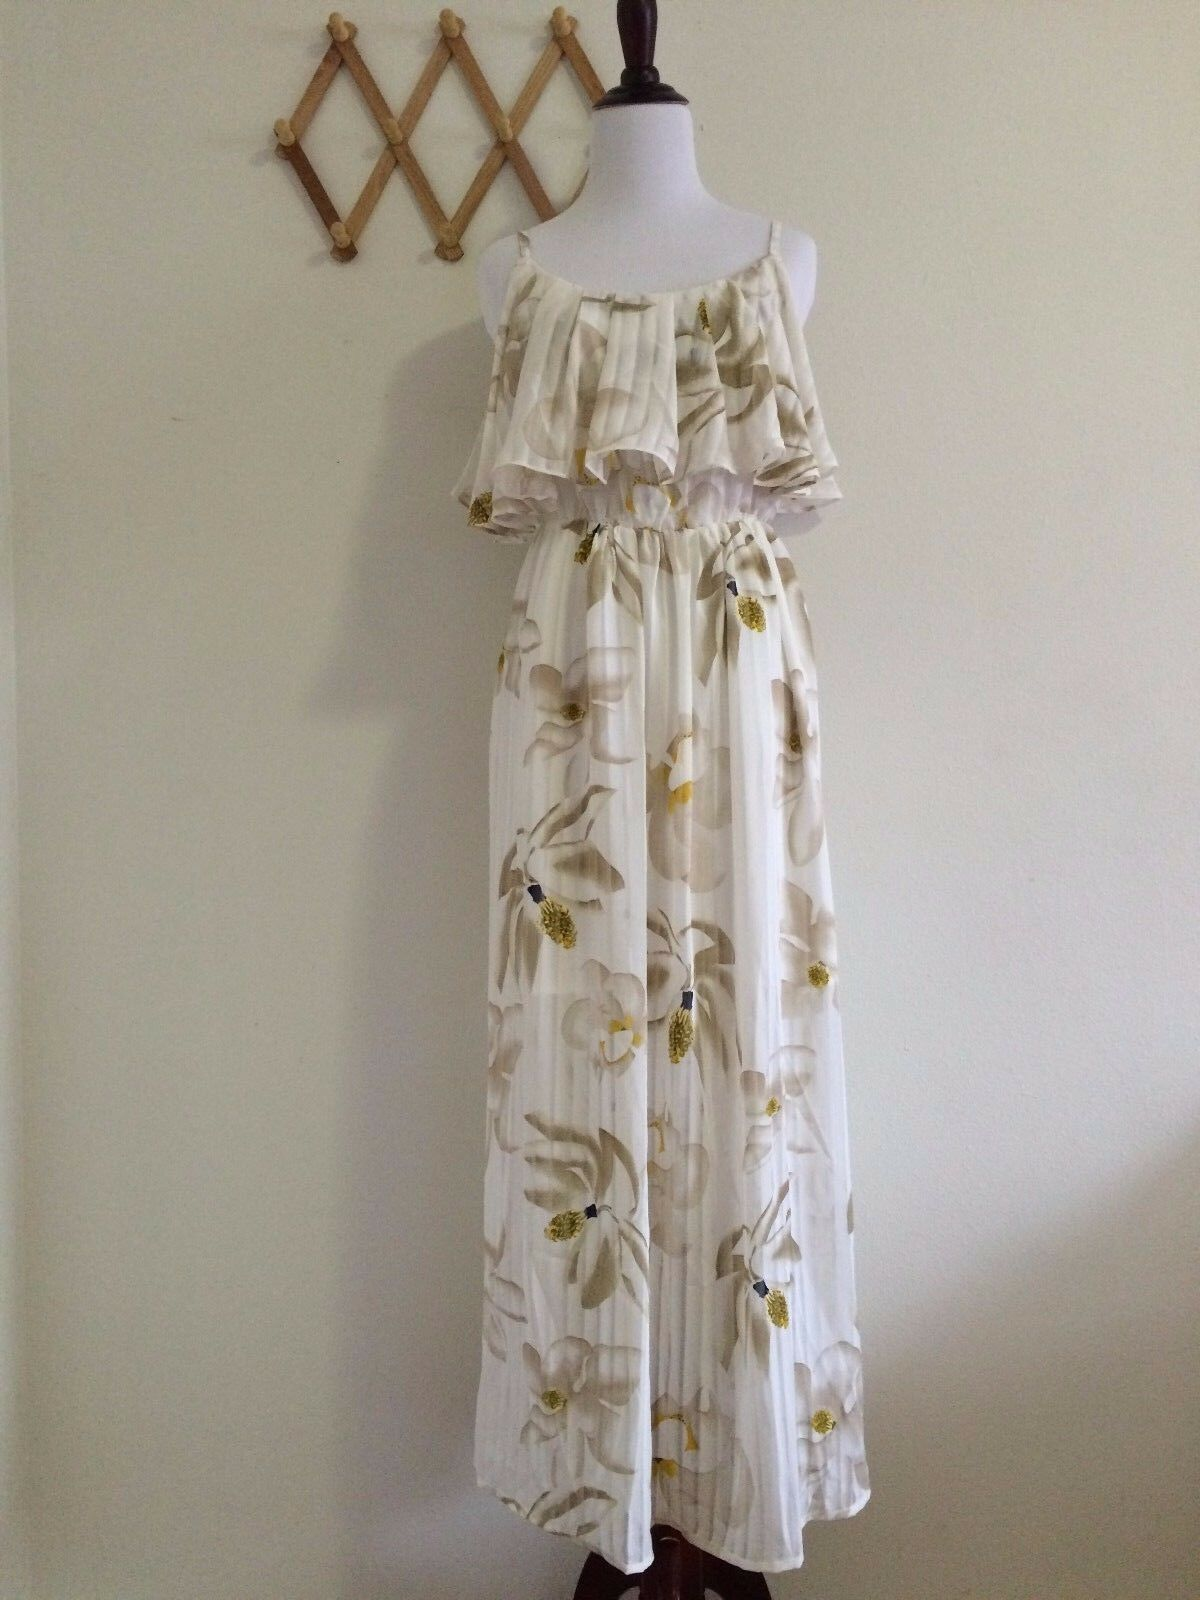 YBE Women's Bohemian style Flounced Maxi Dress Beach SunDress,Size M,NWT